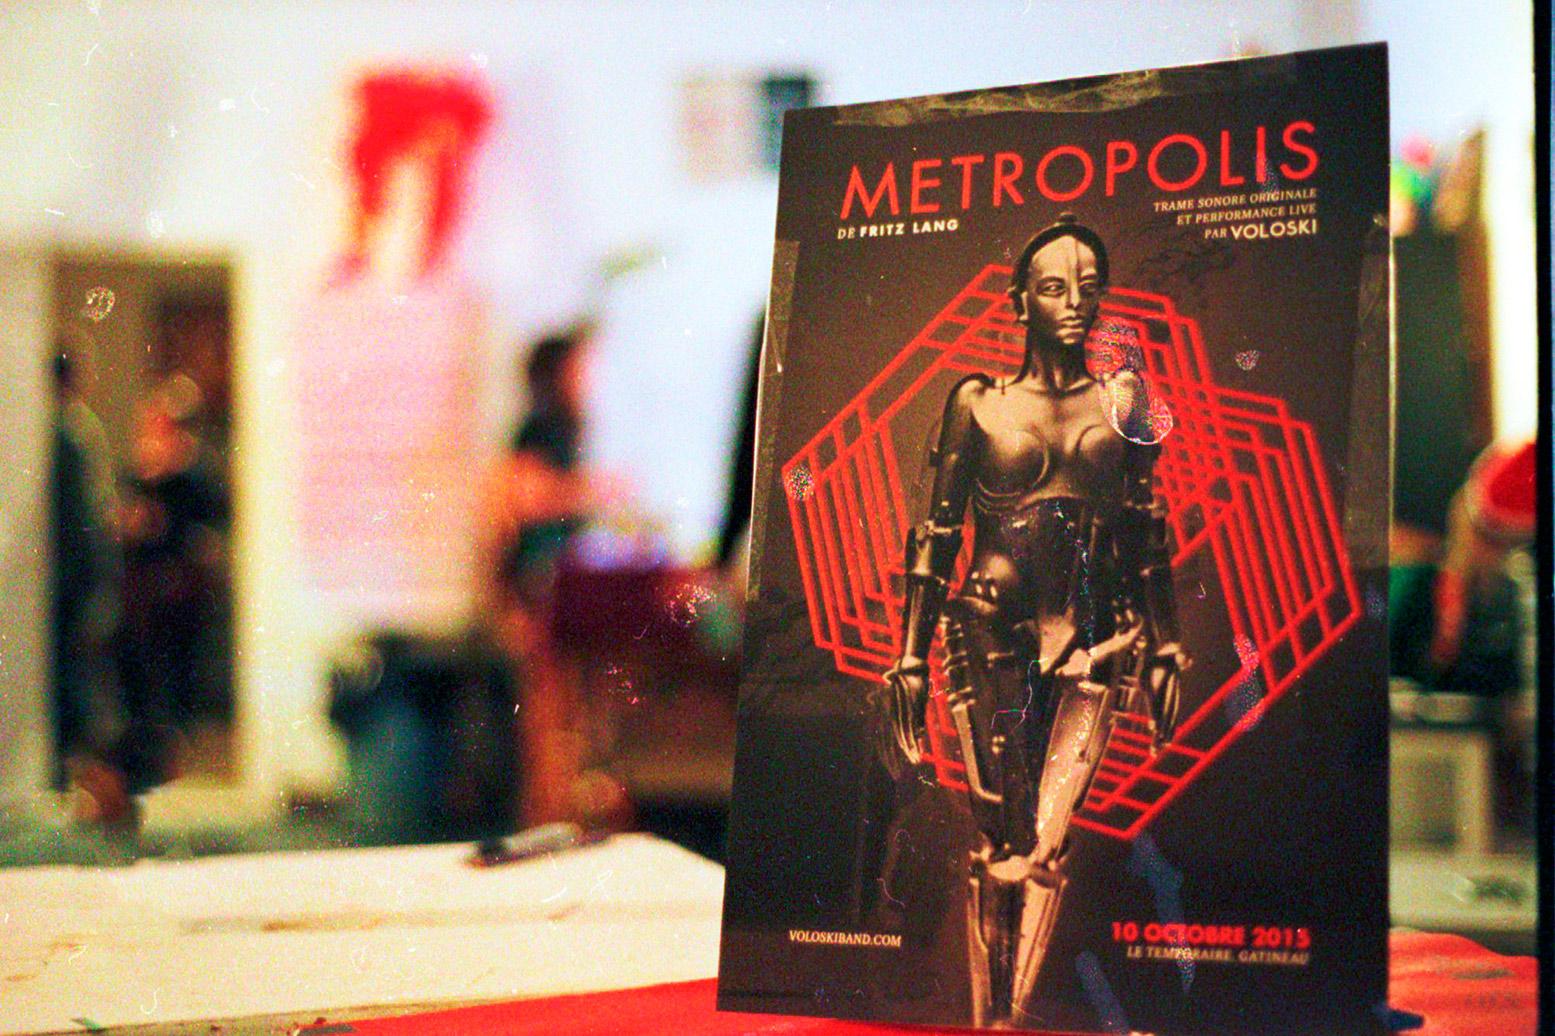 Voloski_metropolis-(5).jpg